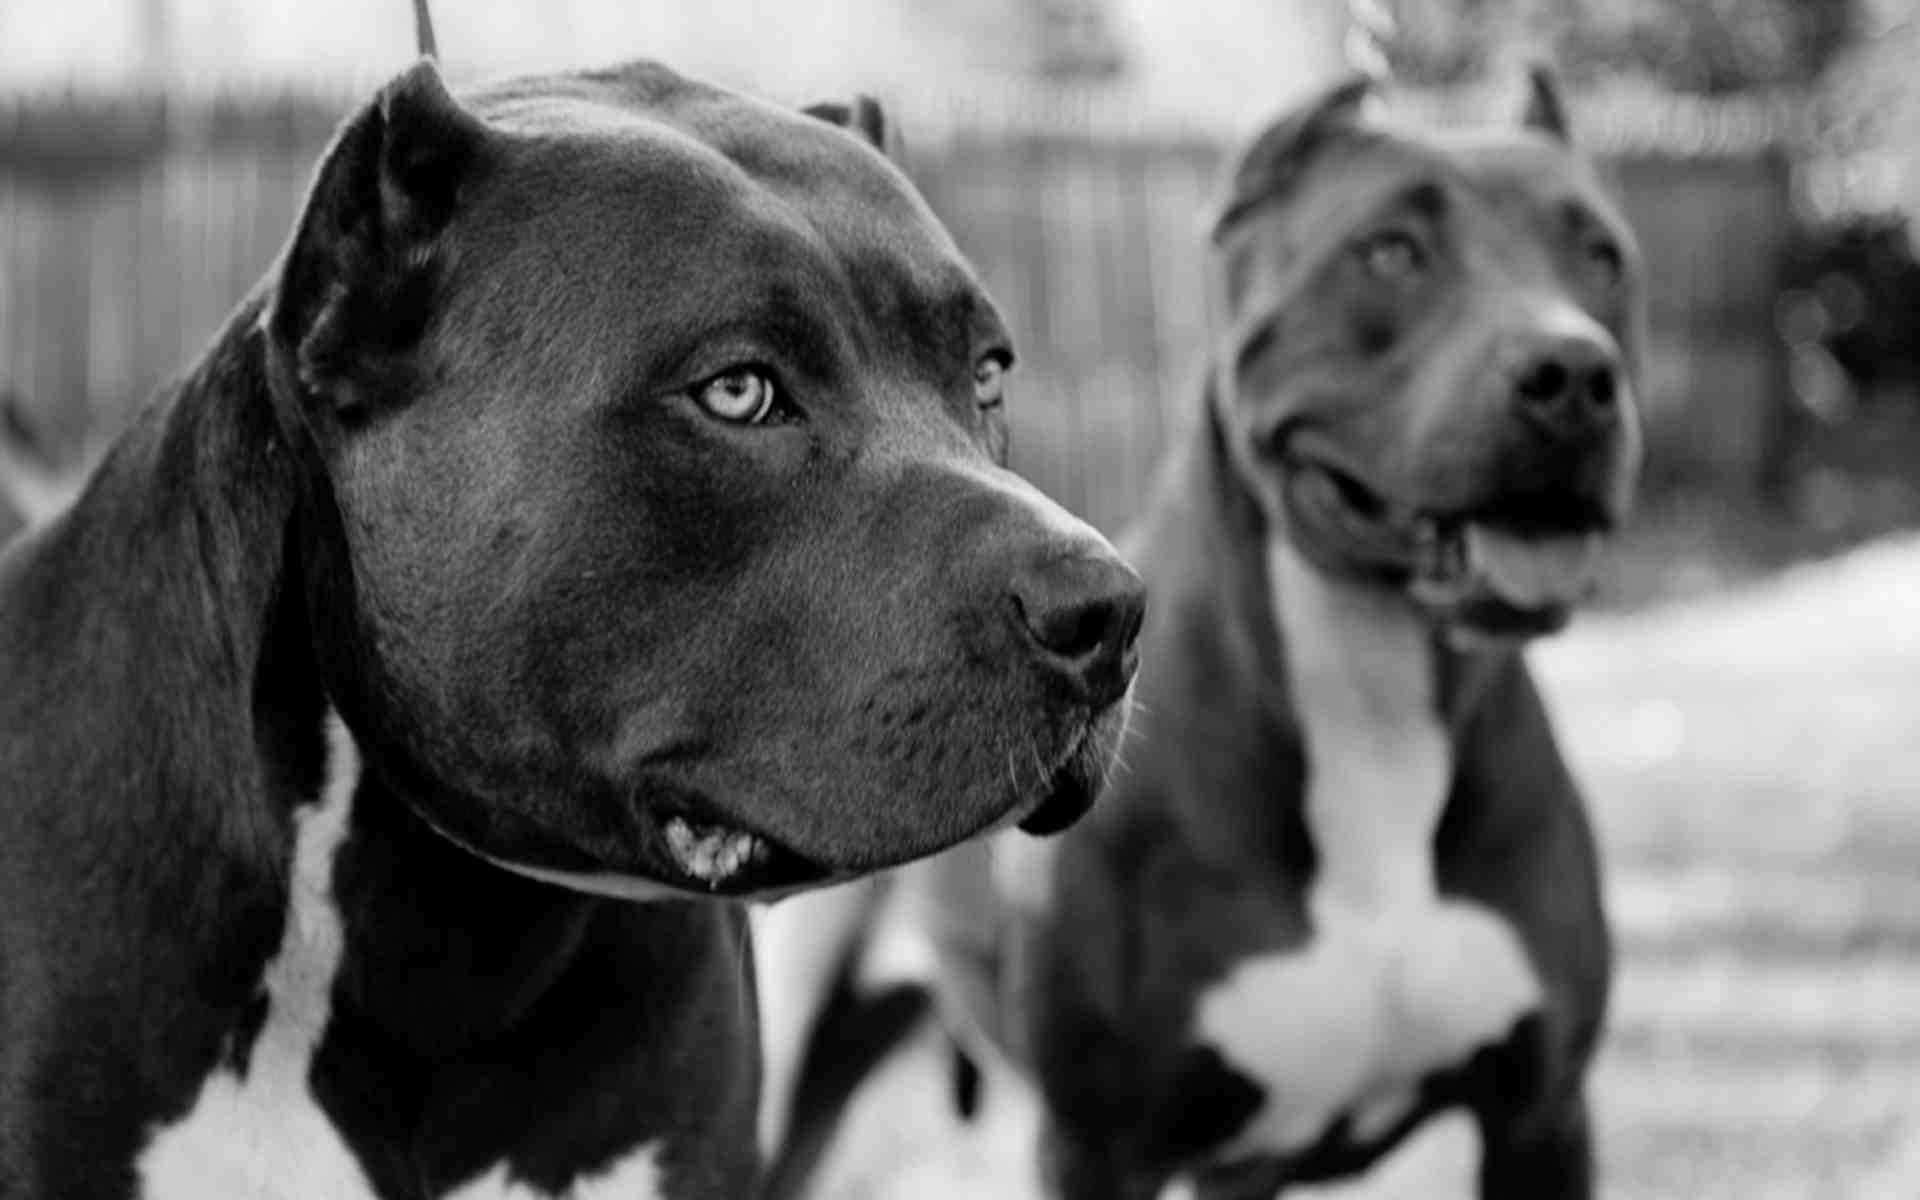 Pitbull Dog Live Wallpaper Download - Pitbull Dog Live Wallpaper ...